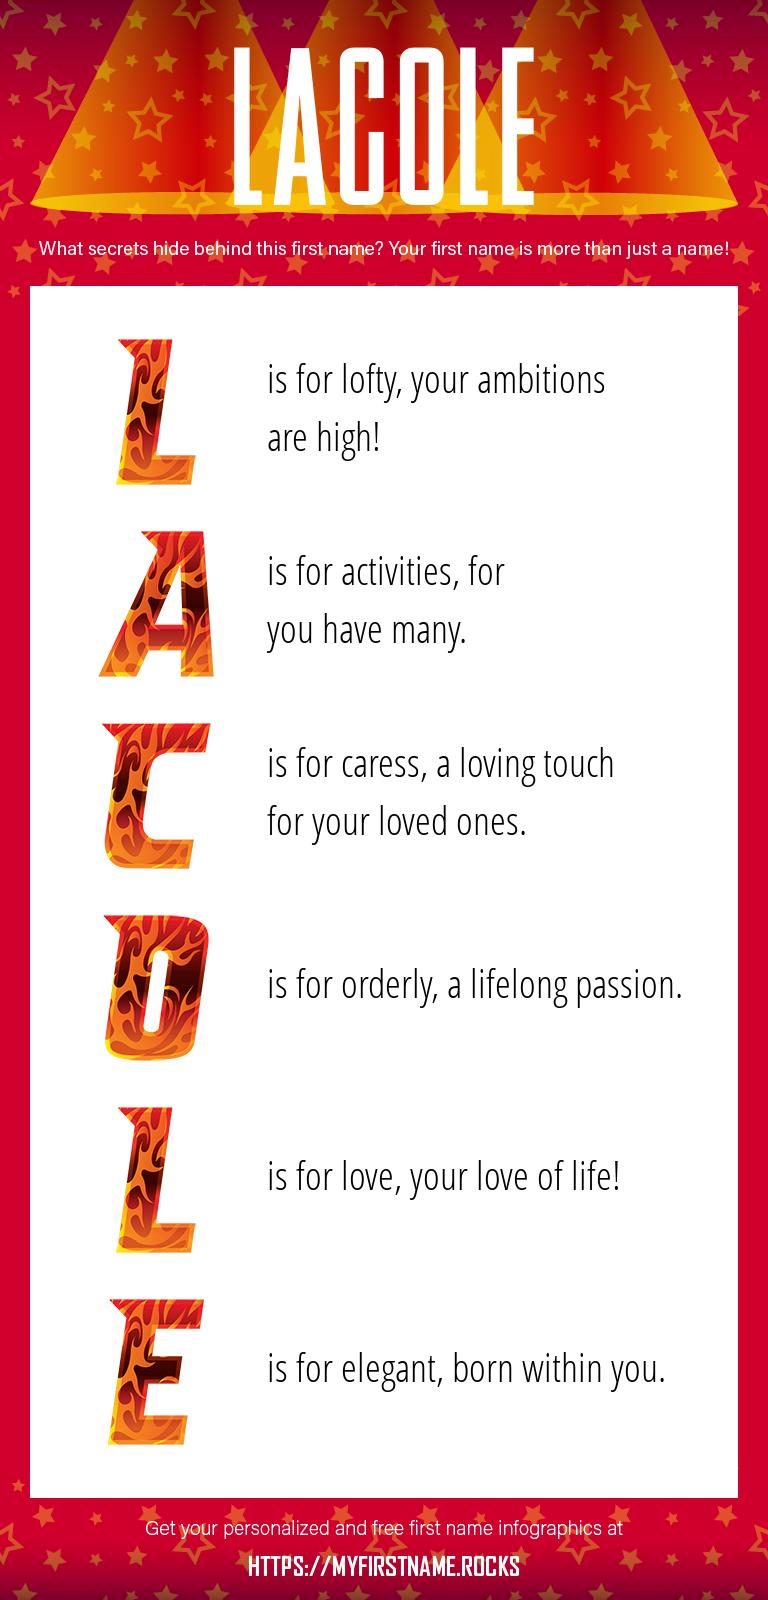 Lacole Infographics